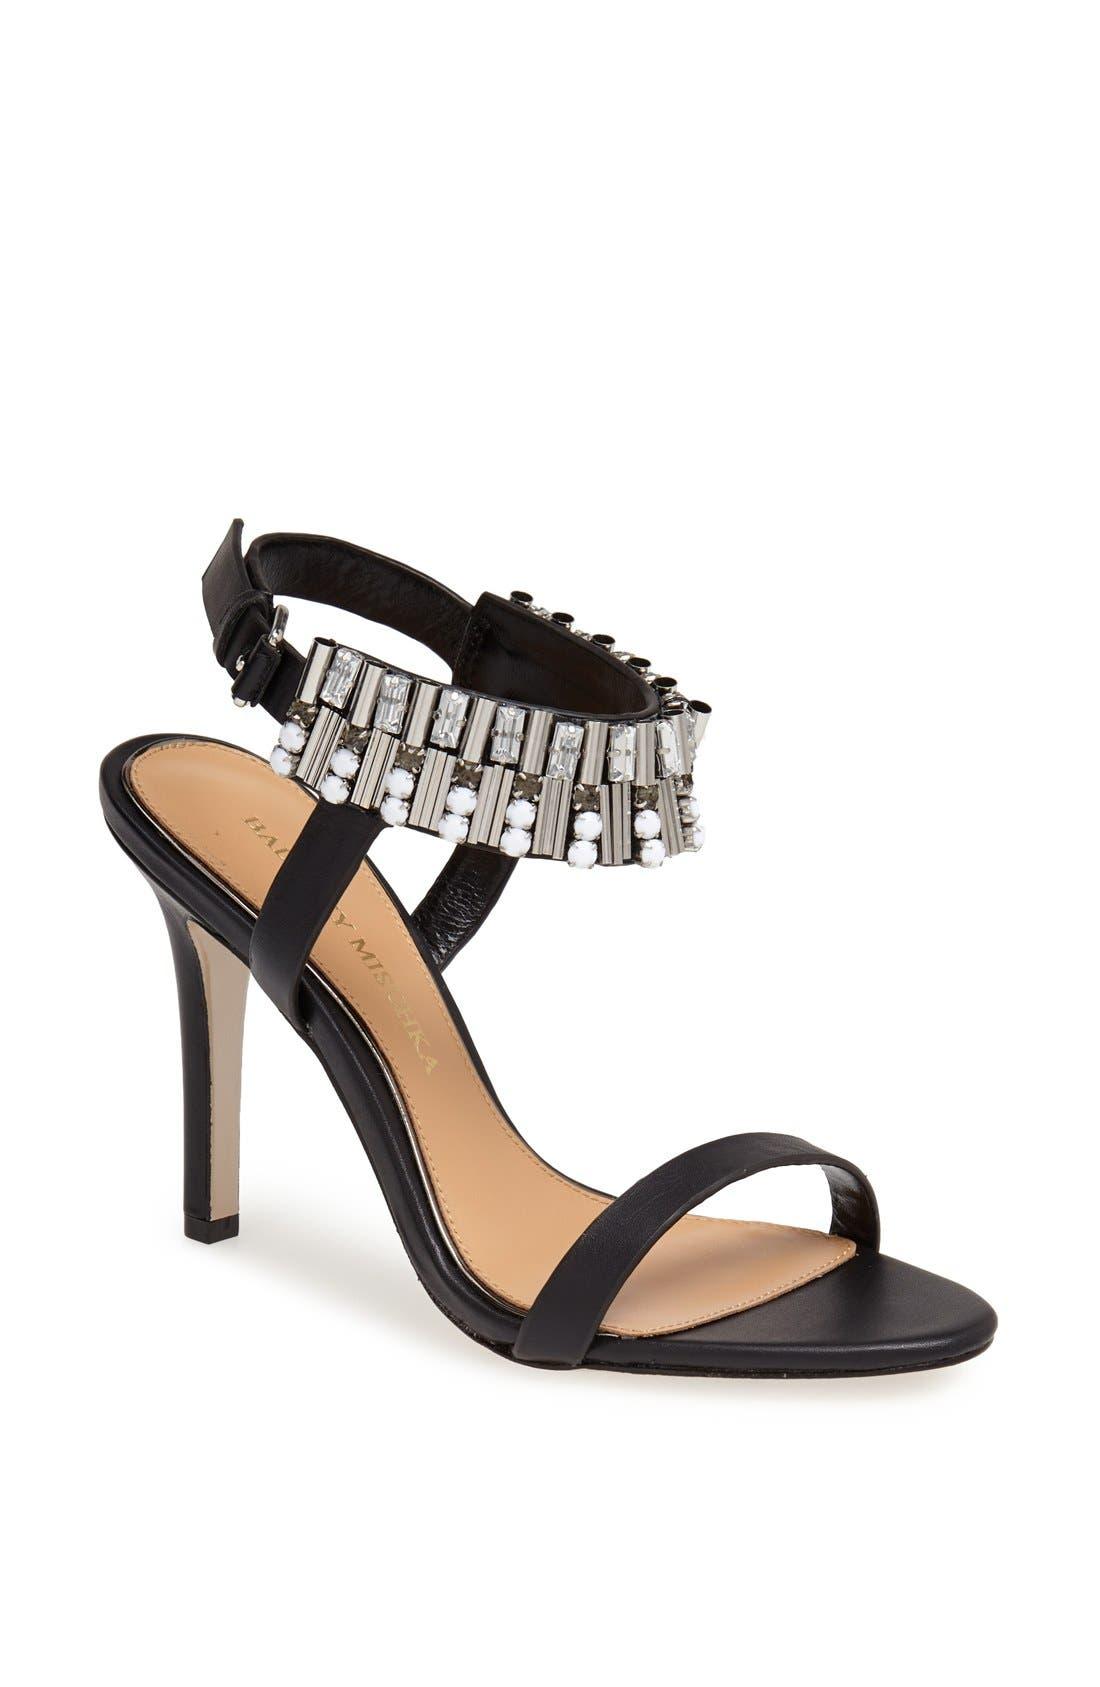 Alternate Image 1 Selected - Badgley Mischka 'Kallan' Crystal Cuff Leather Sandal